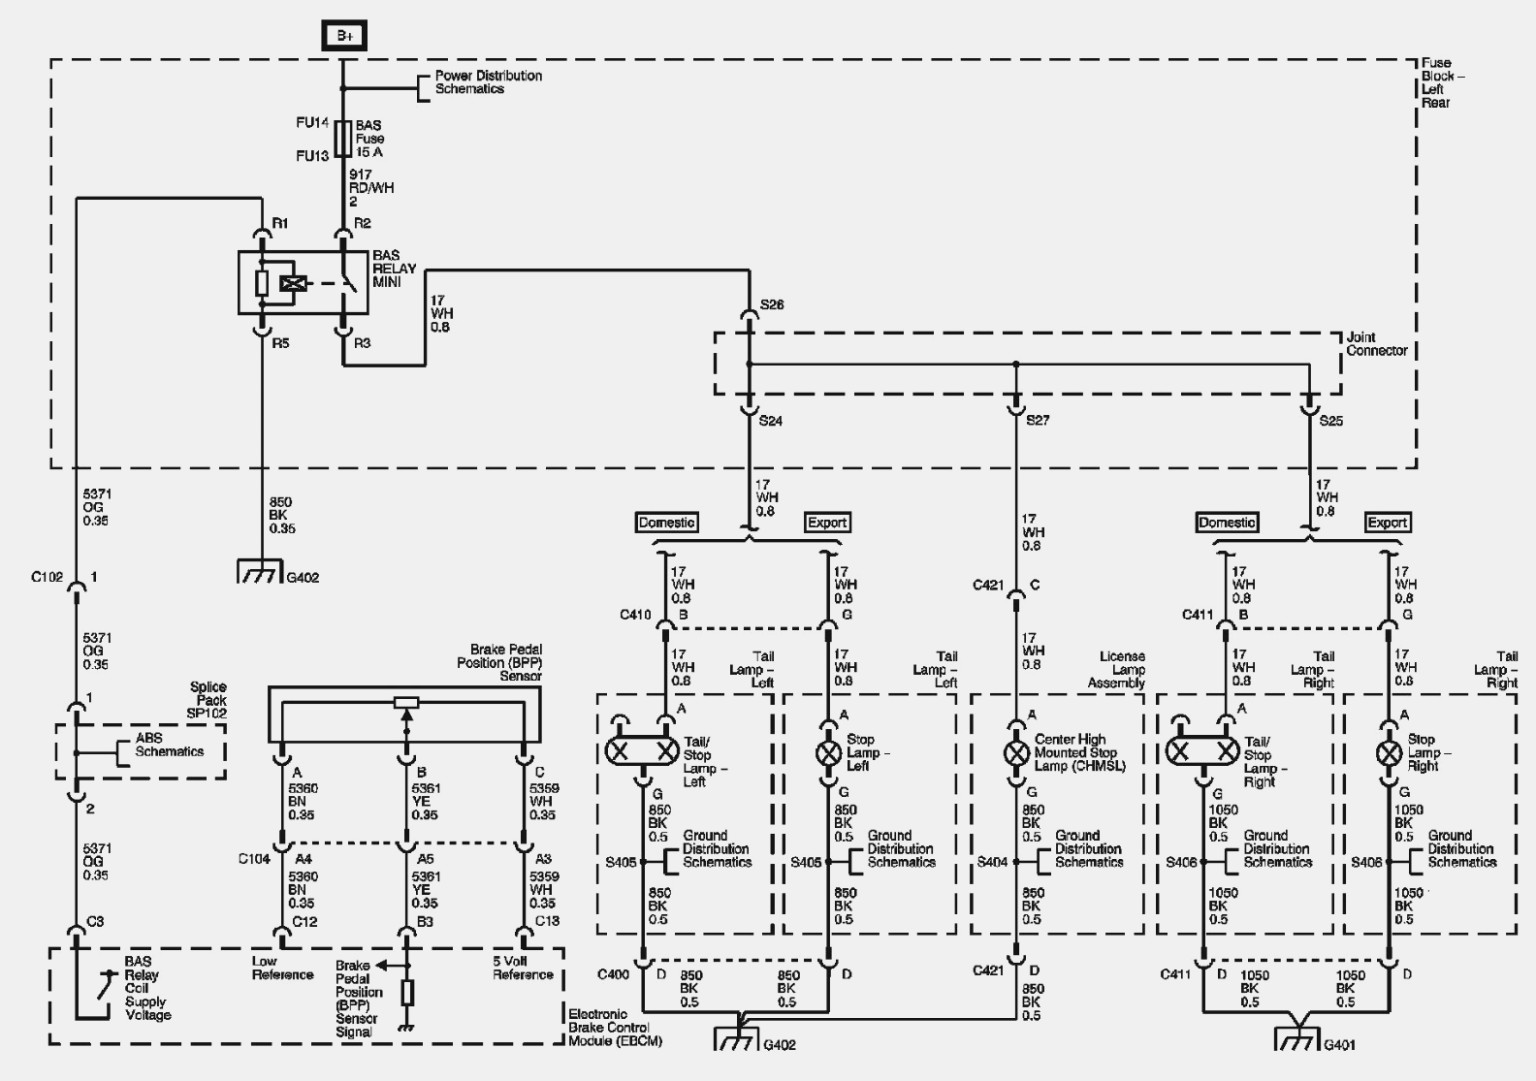 [DIAGRAM_5FD]  AW_5499] Cadillac Srx Wiring Harness Schematic Wiring | Cadillac Srx Wiring Diagram |  | Stap Tixat Mohammedshrine Librar Wiring 101